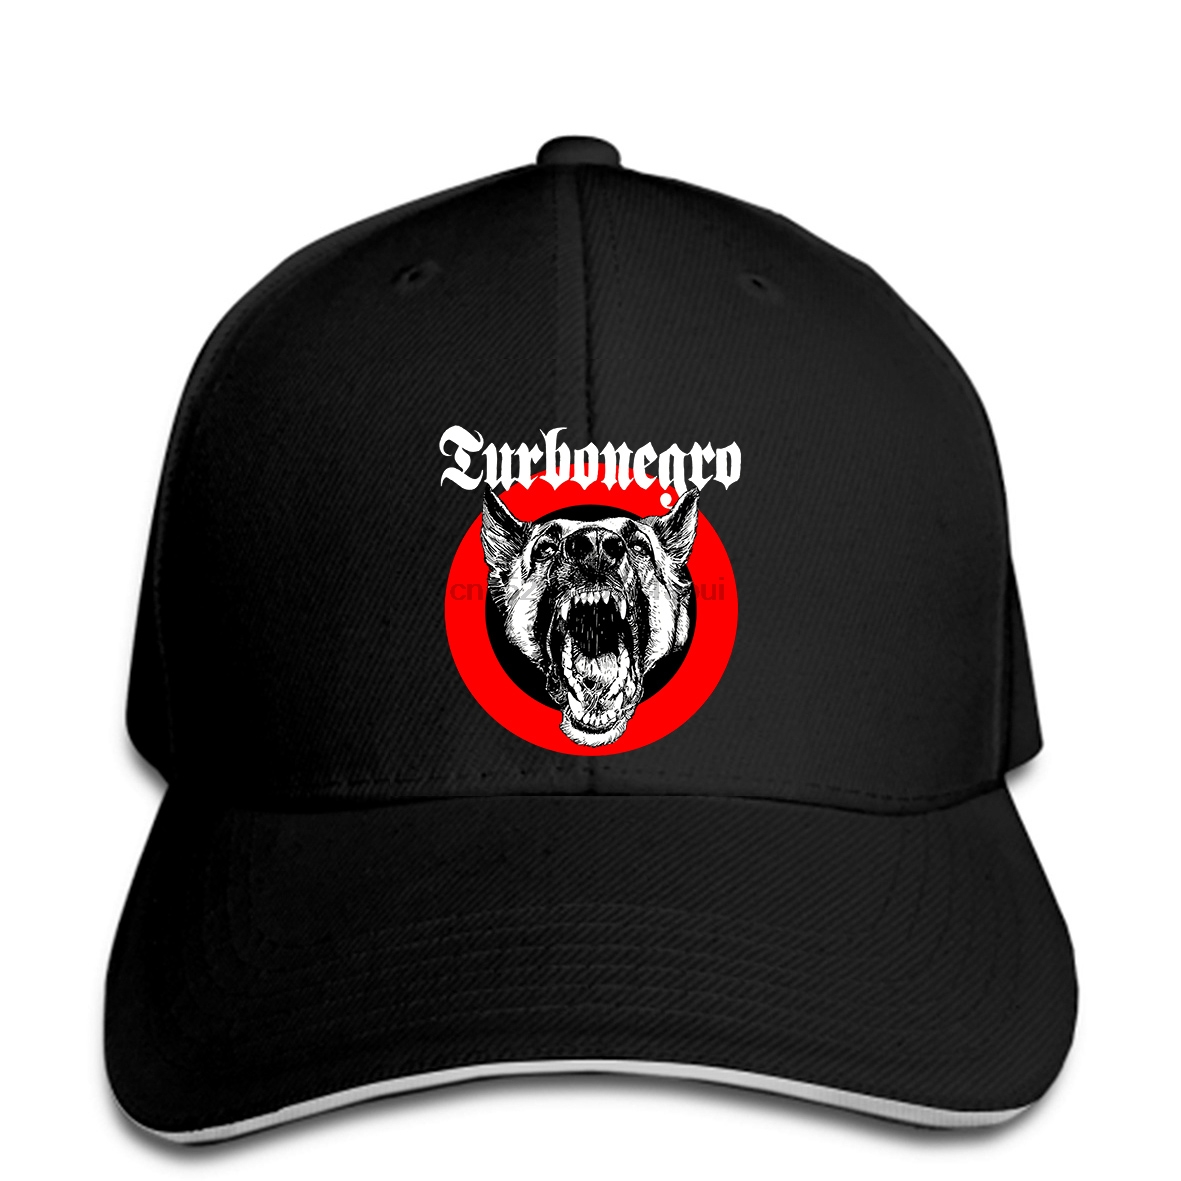 Baseball cap Turbonegro Baseball caps by Chris Shary. Punk. Limited. Exclusive